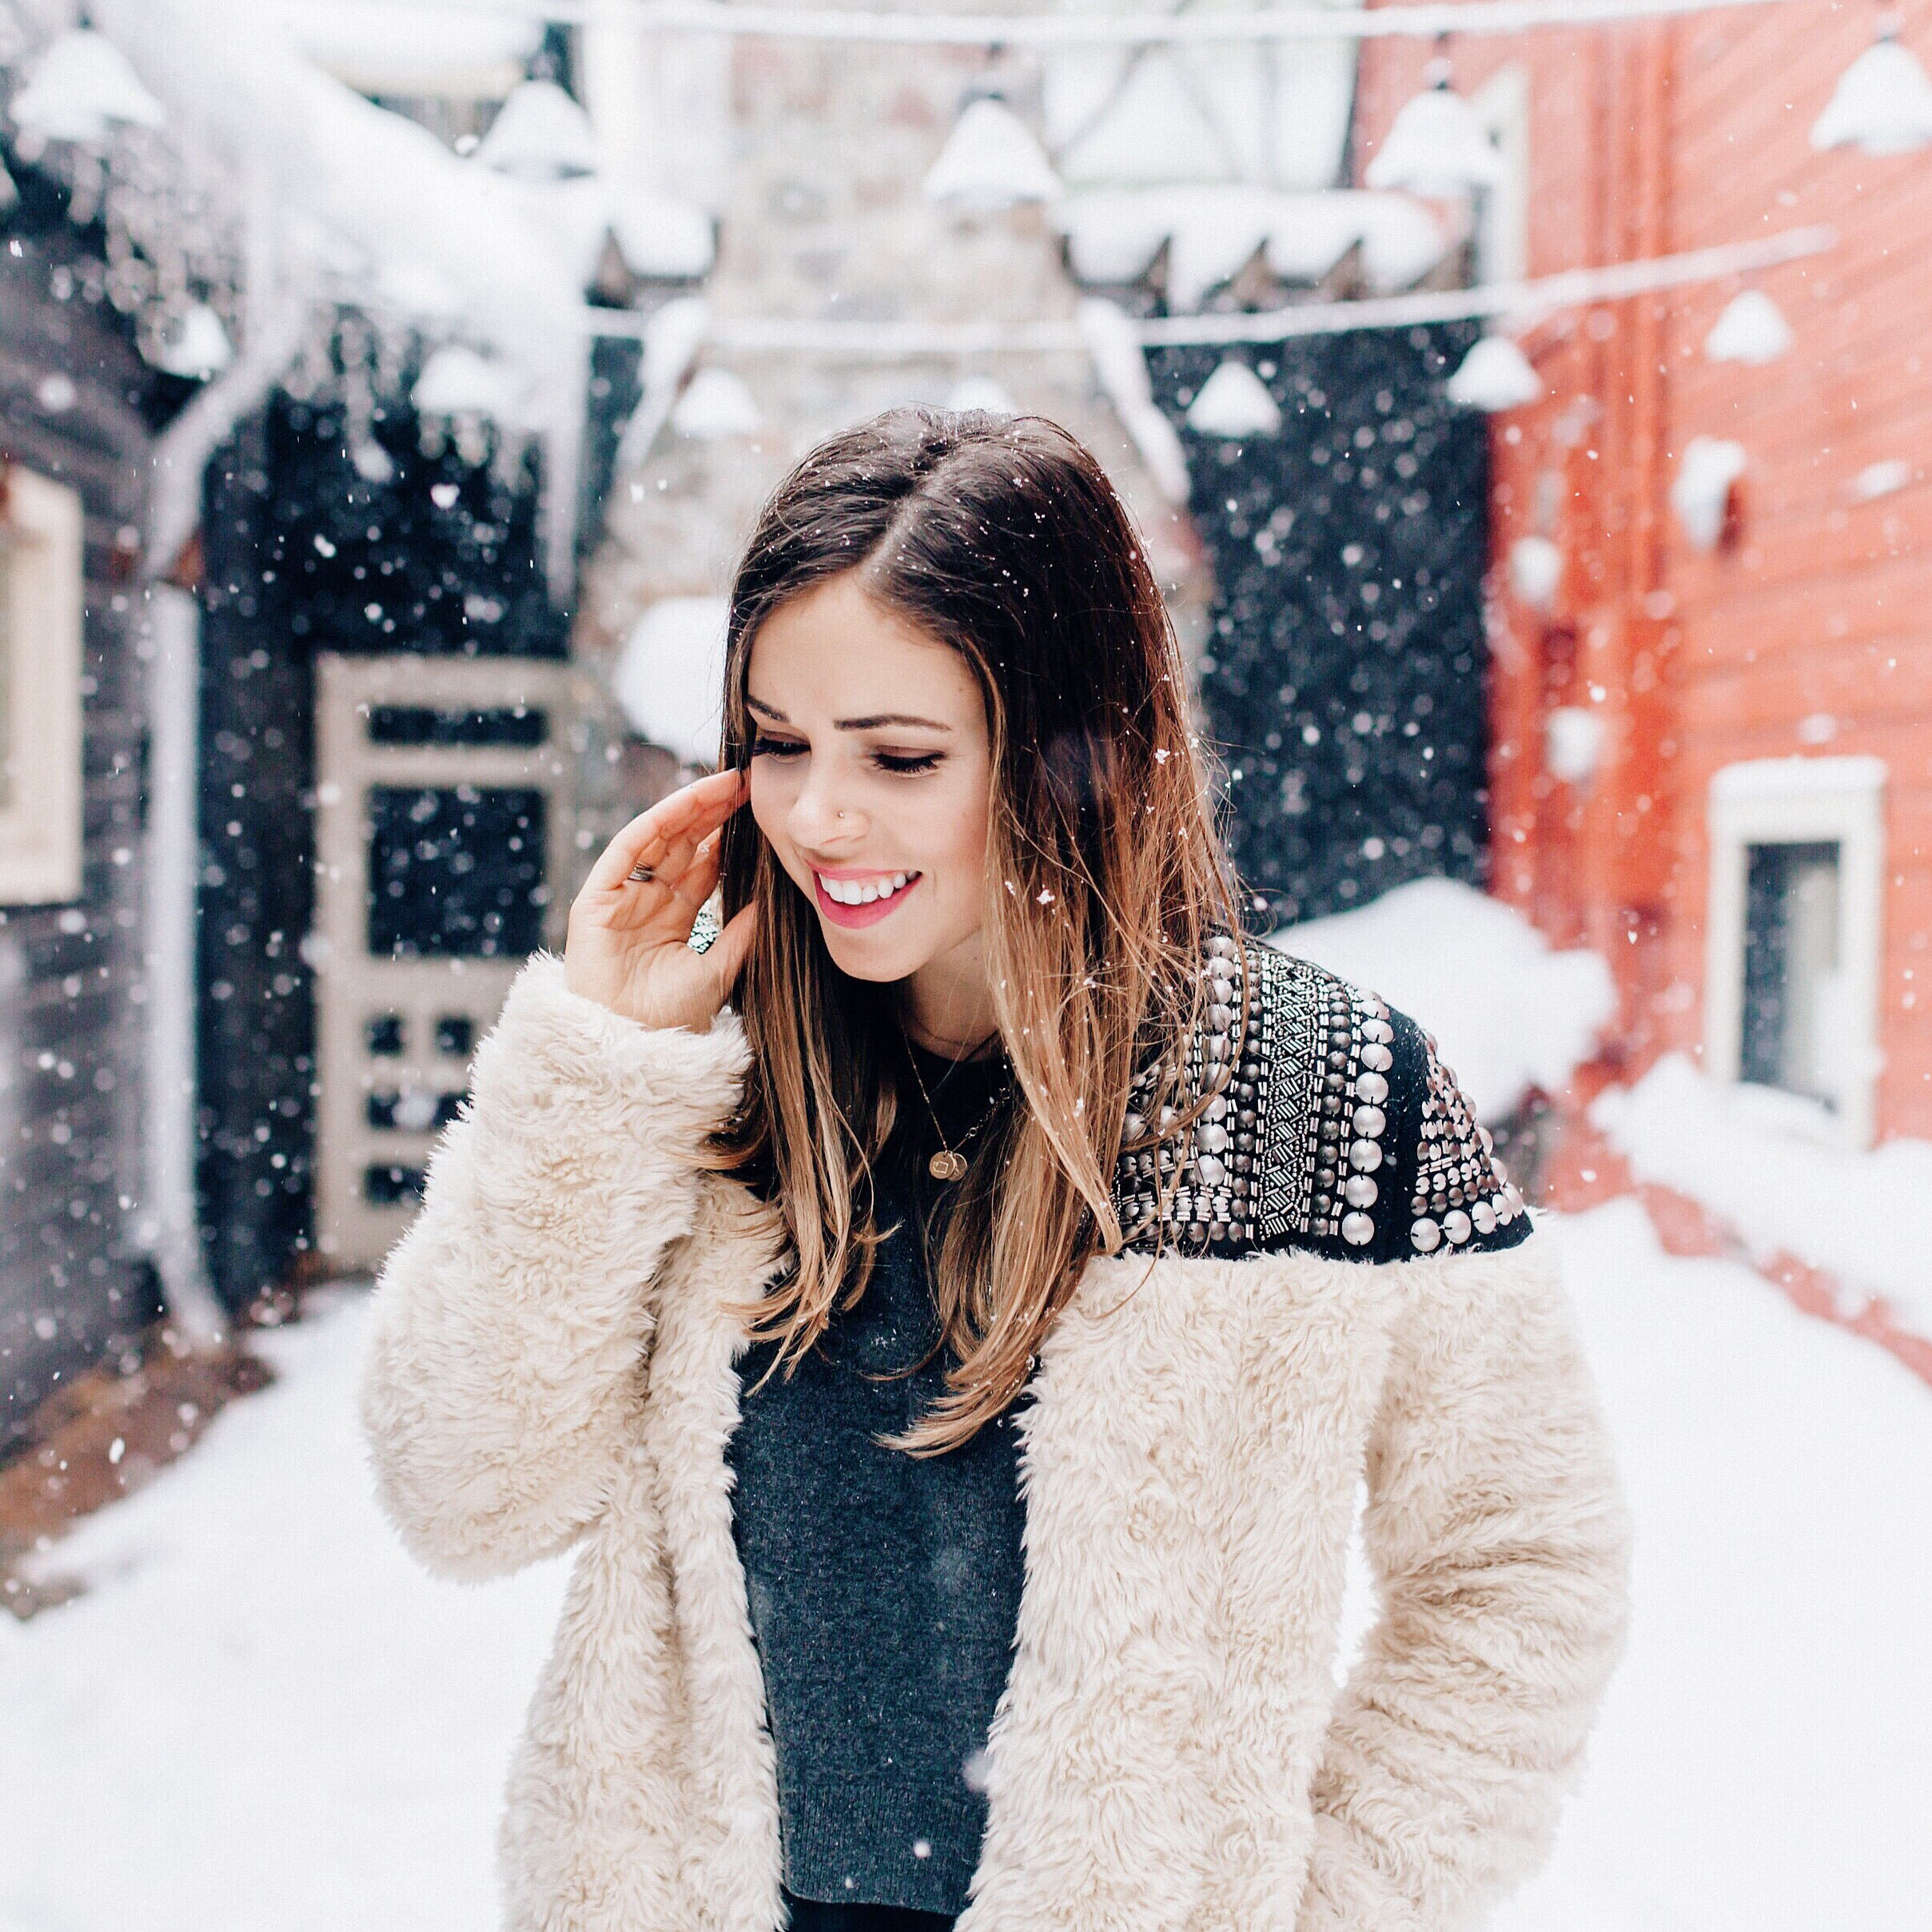 Sundance winter wonderful / photo by http://www.anchoredimagephotography.com/